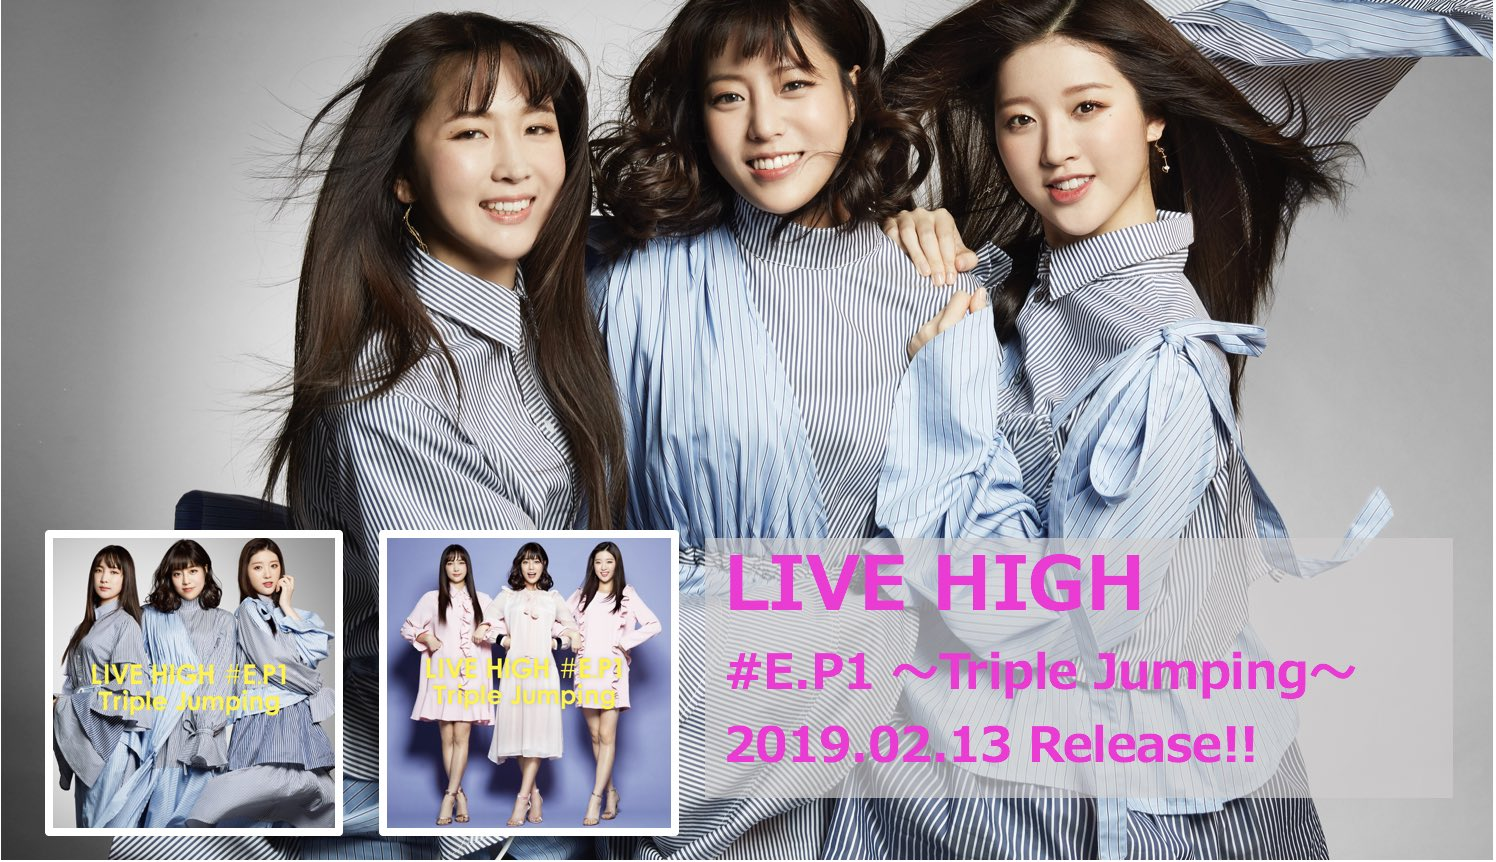 LIVE HIGH #E.P1